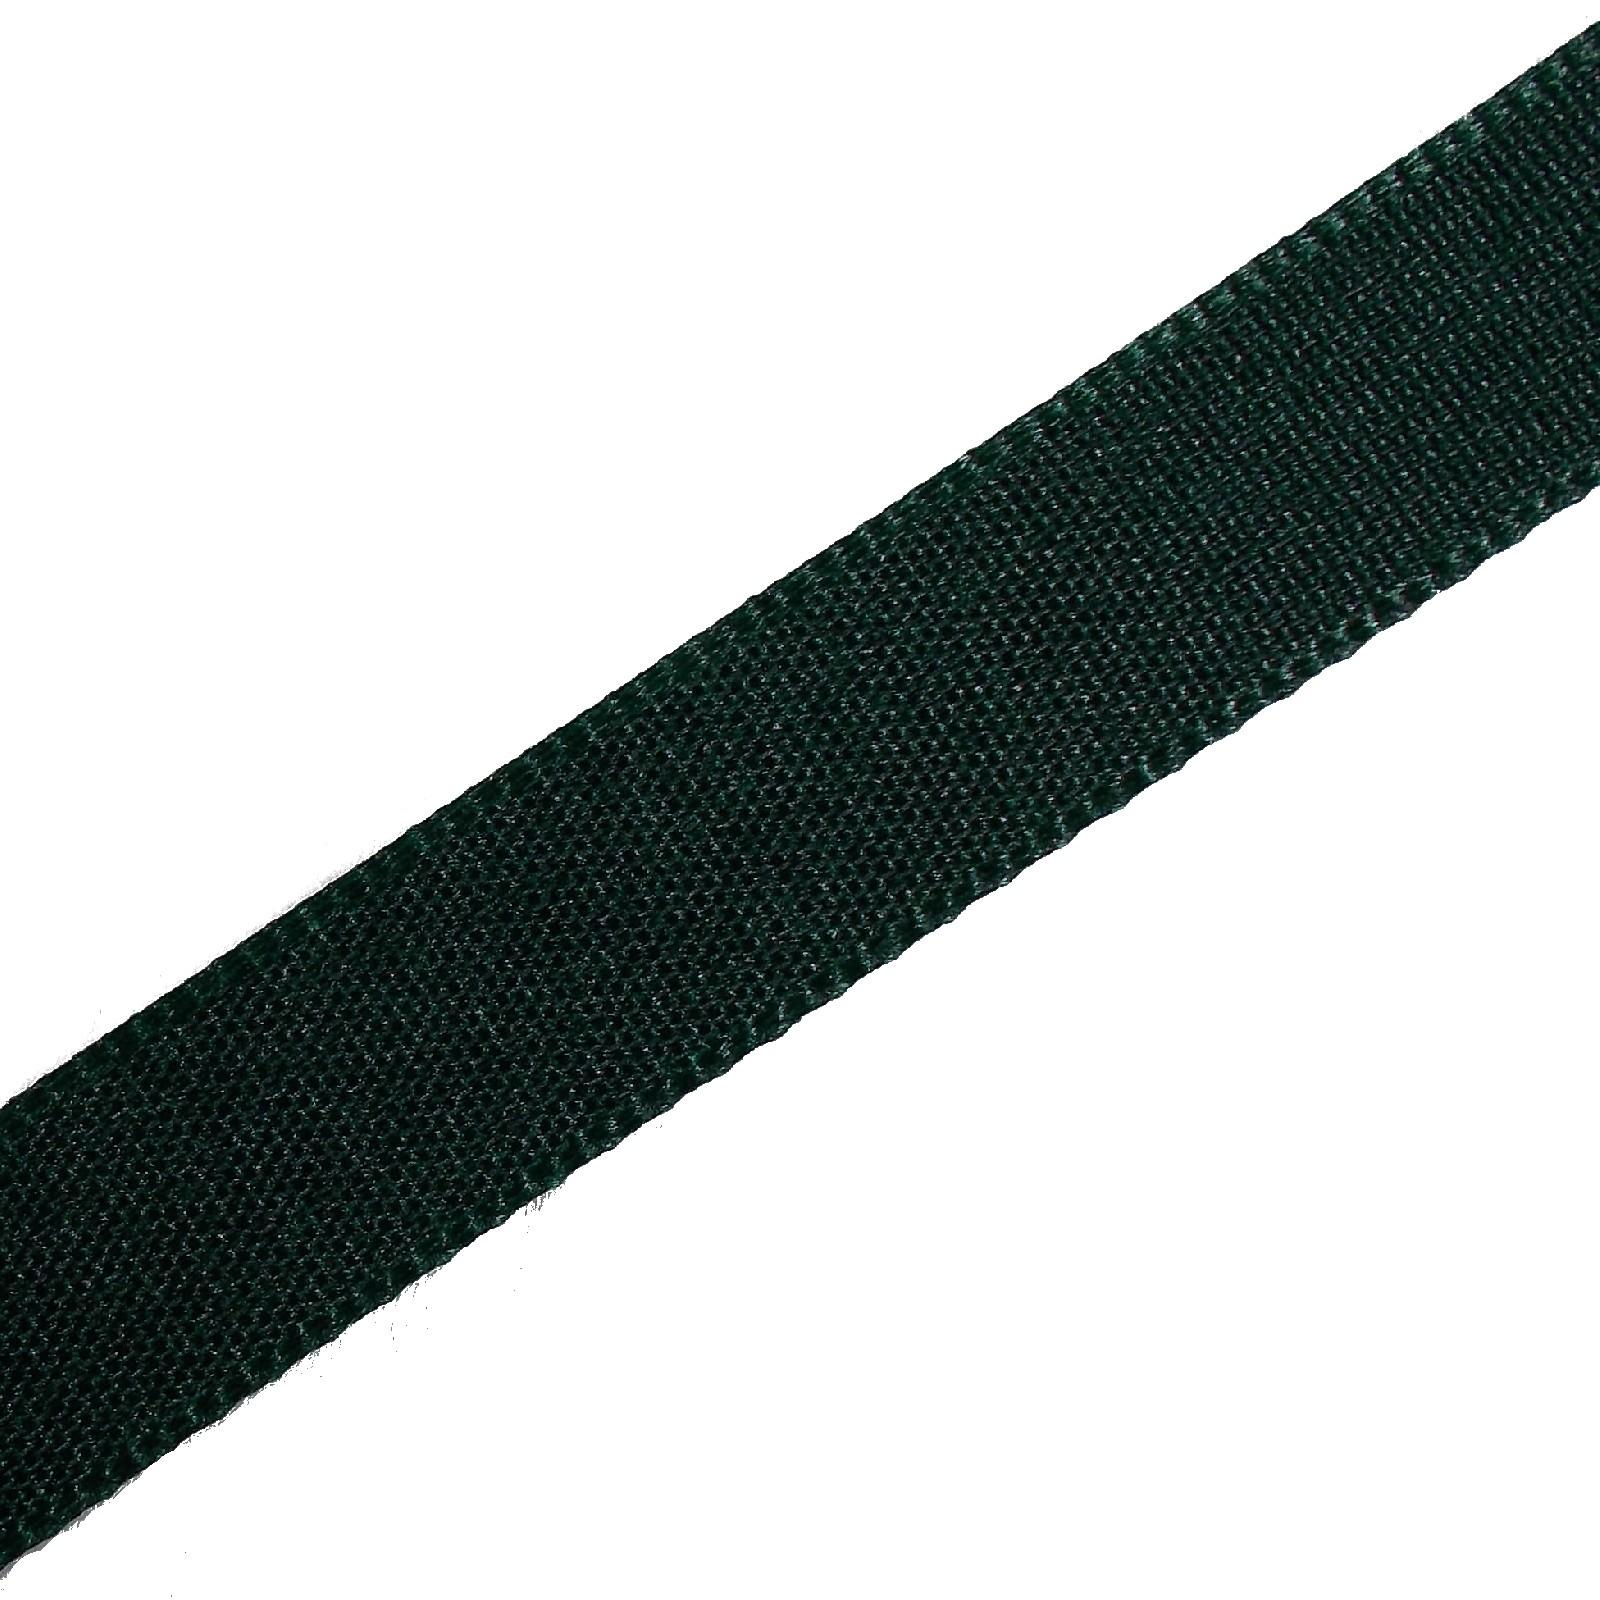 Berisfords Seam Binding Polyester Ribbon Tape 25mm wide Green 1 metre length